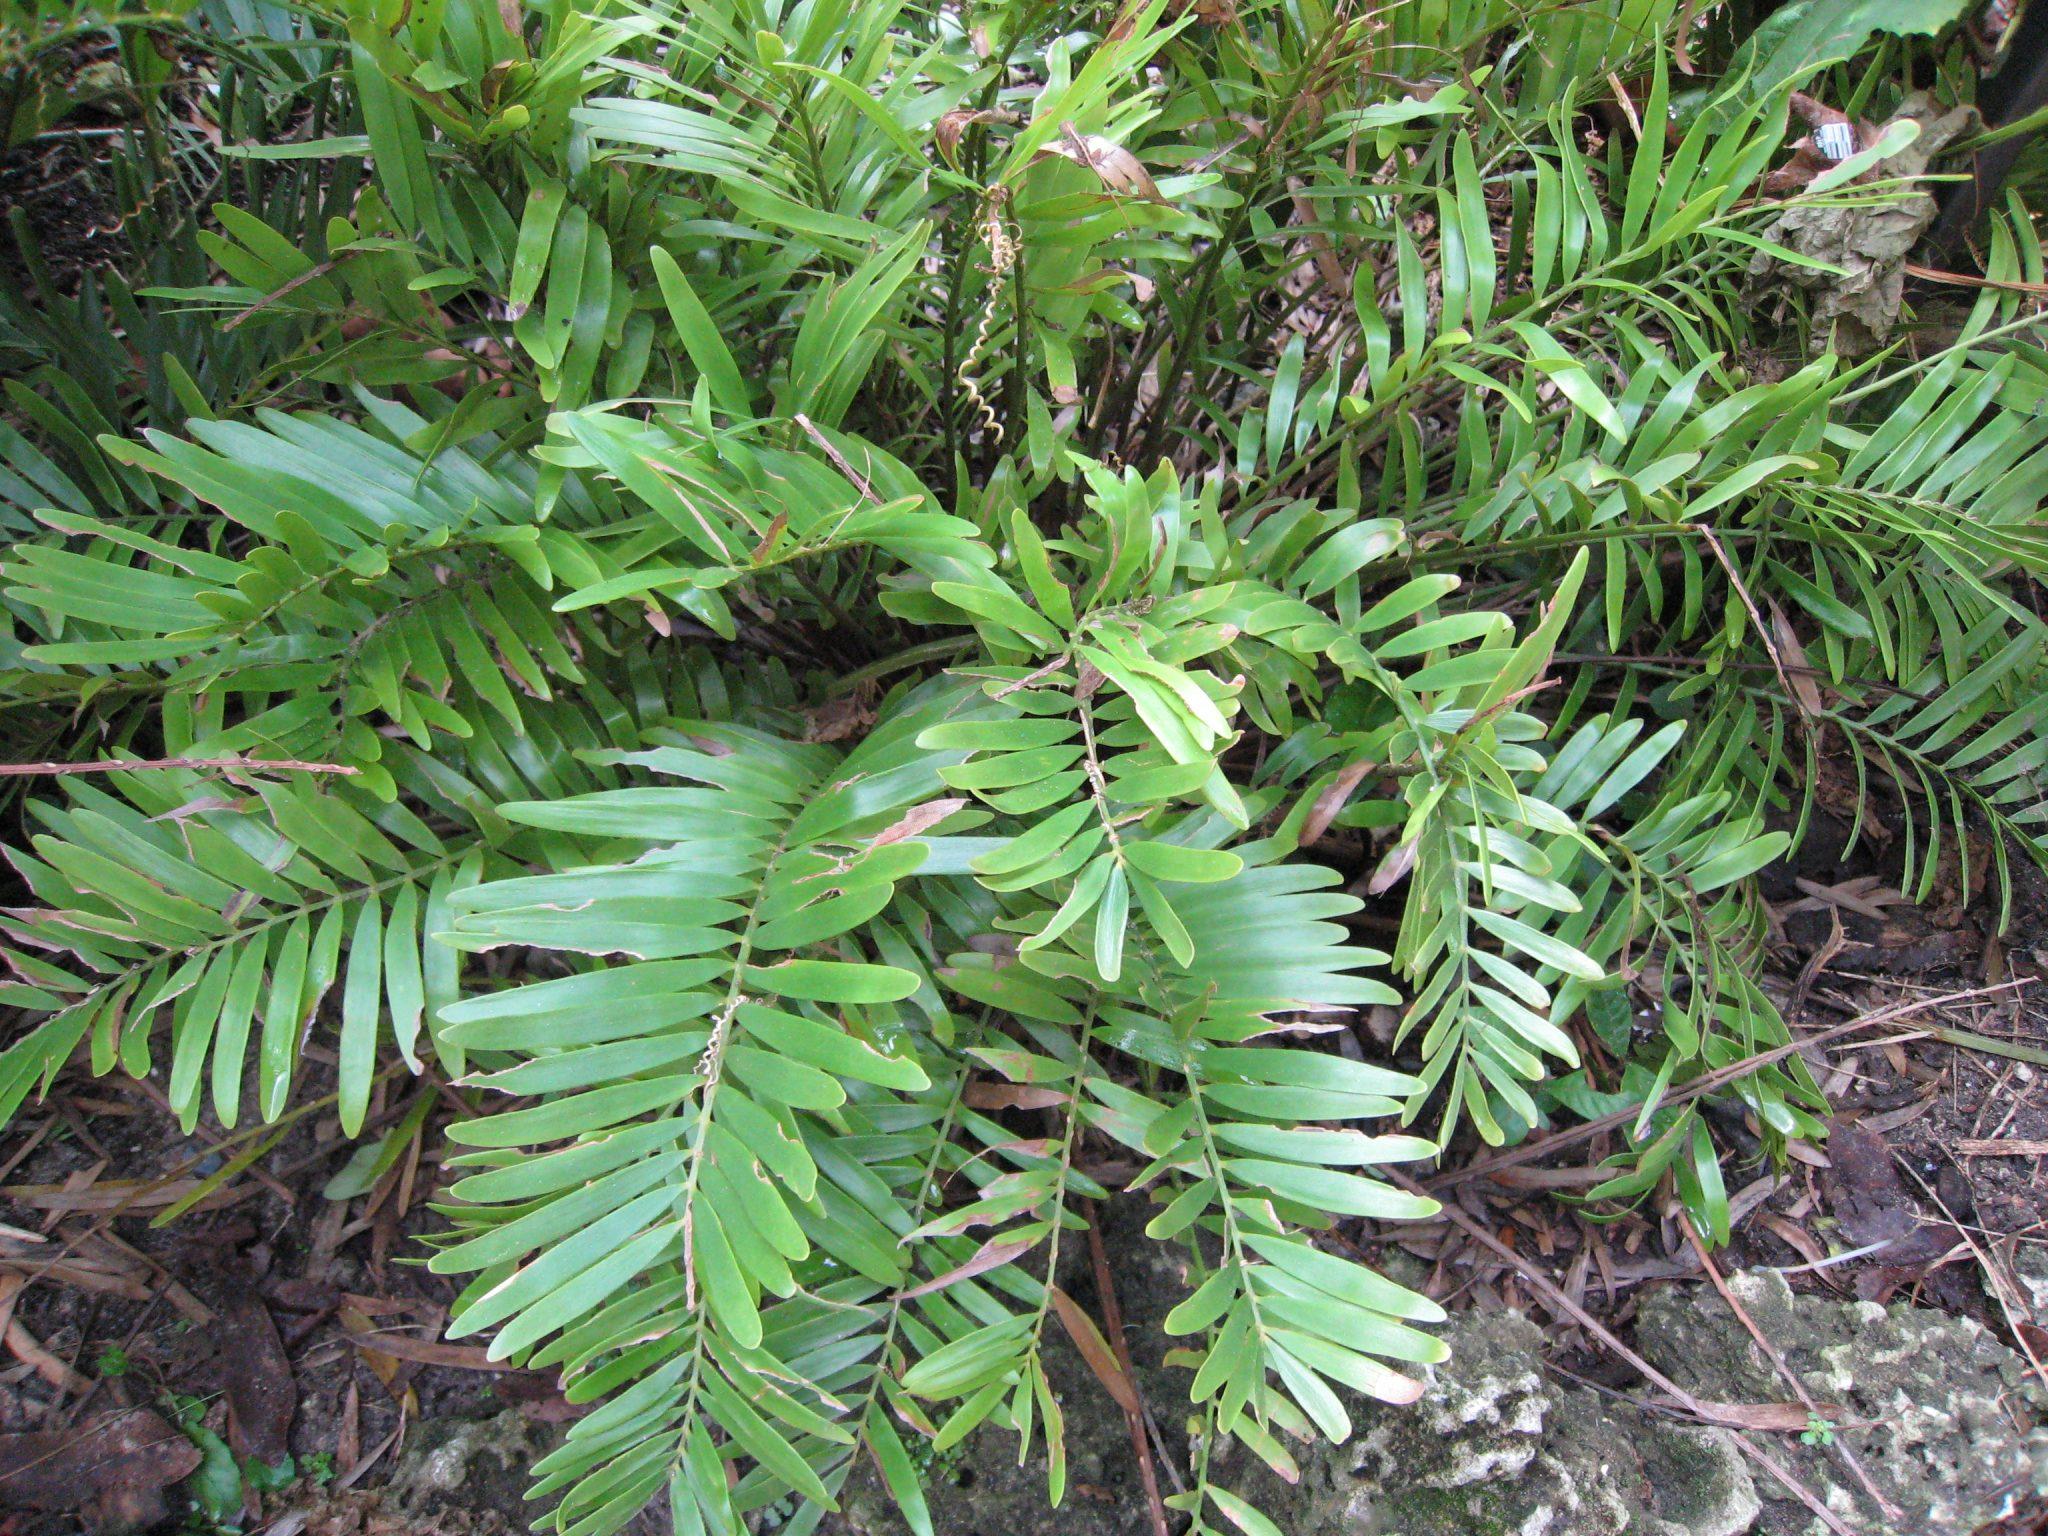 Richard lyons nursery inc page 48 of 53 rare for Planta ornamental zamia